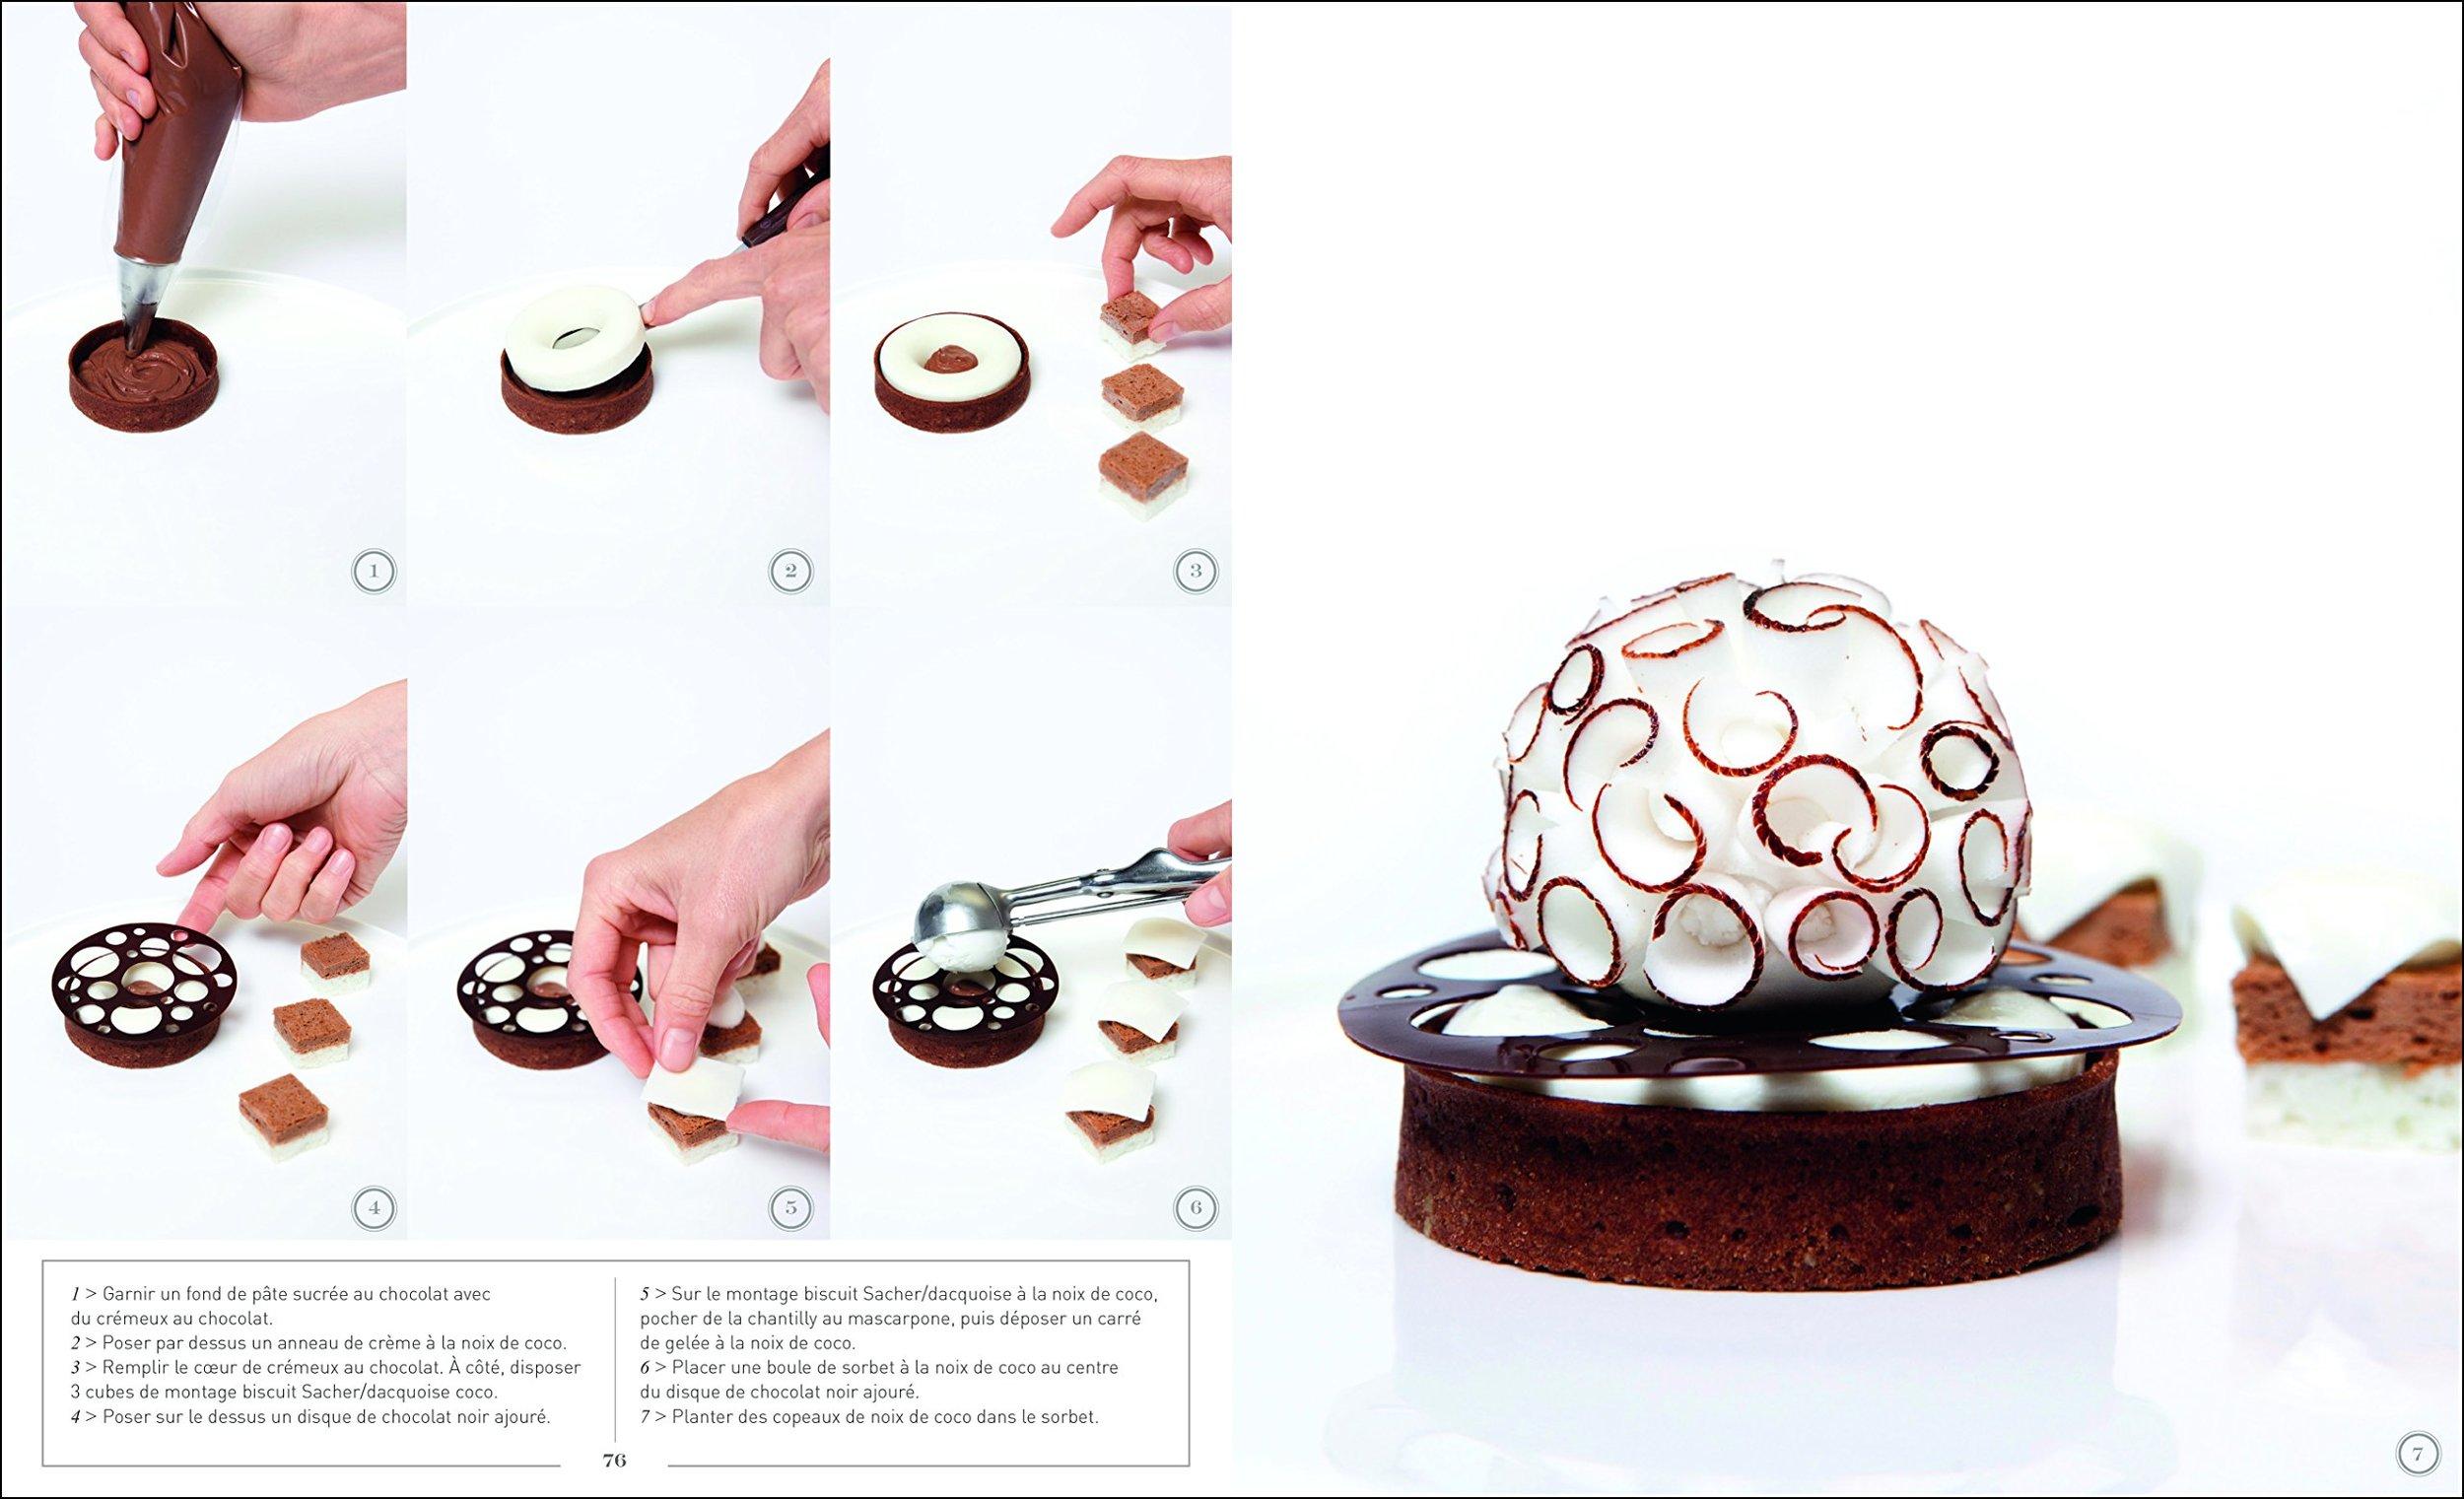 Claire Heitzler 細膩精準的的甜點設計與製作手法。 Photo| Amazon.fr